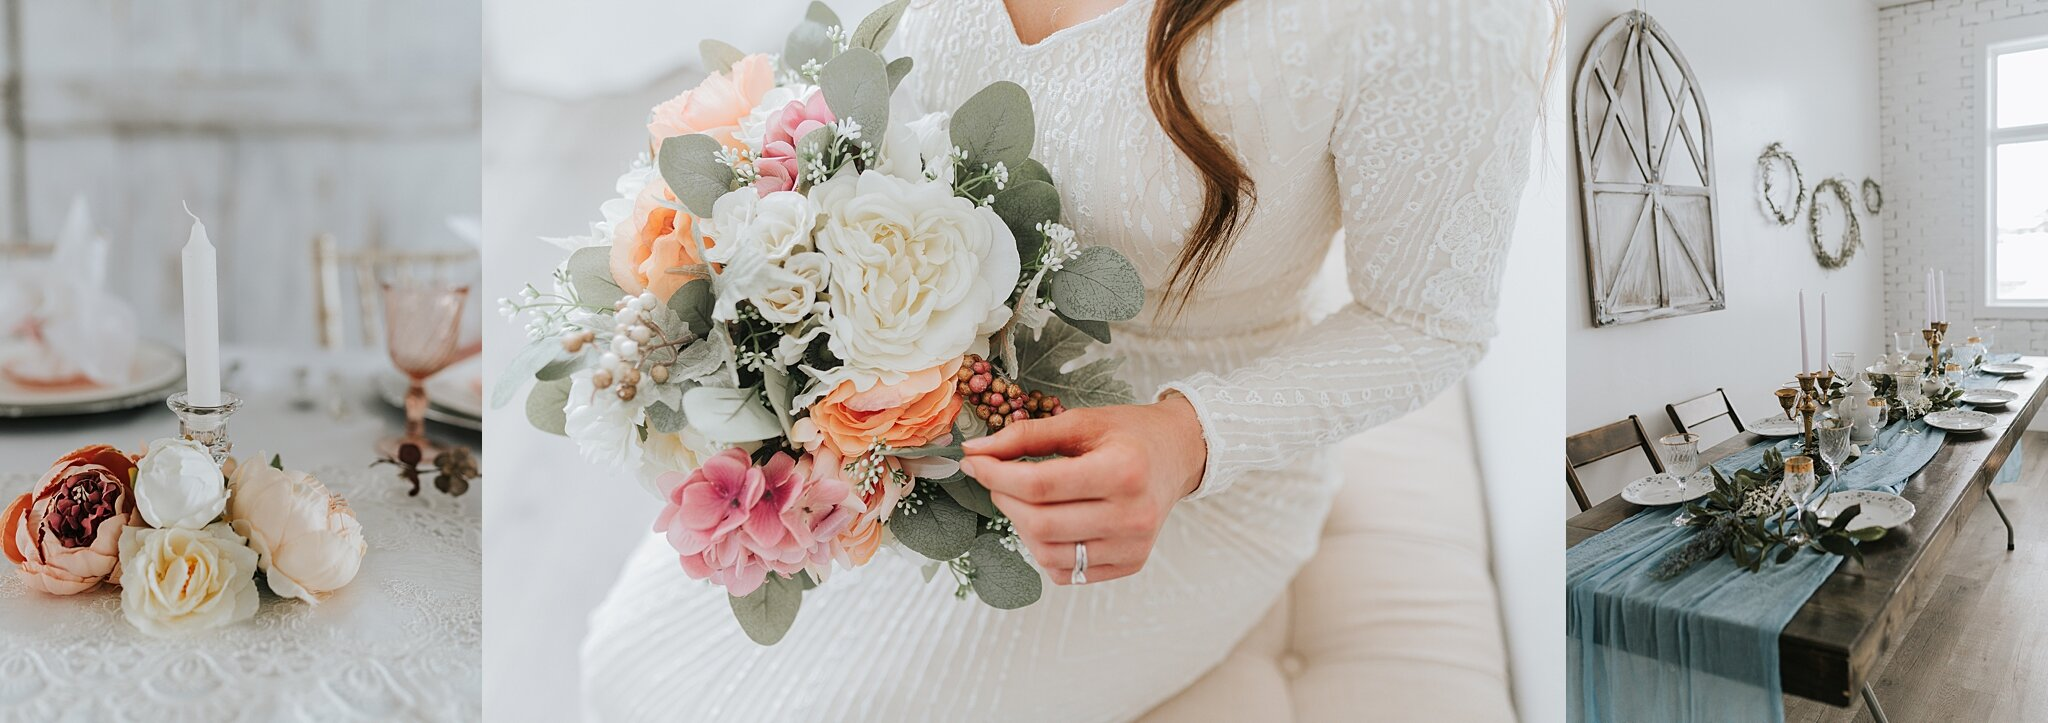 elegant-modern-bride-blush-bouquet-southern-dream-wedding-look-for-the-light-photo-video